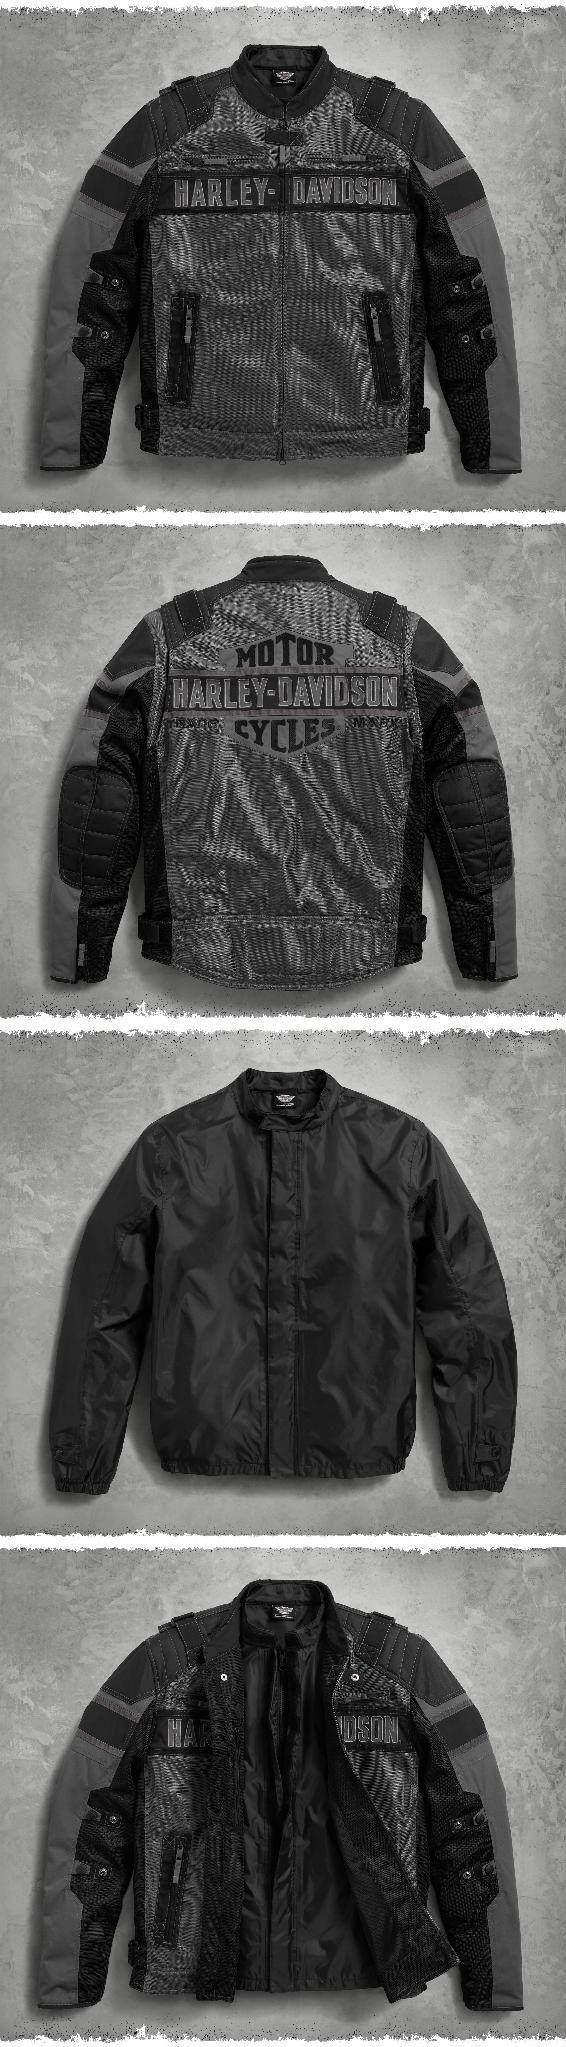 A jacket that can navigate the seasons makes a loyal travel partner. | Harley-Davidson Men's Codec Textile/Mesh Riding Jacket